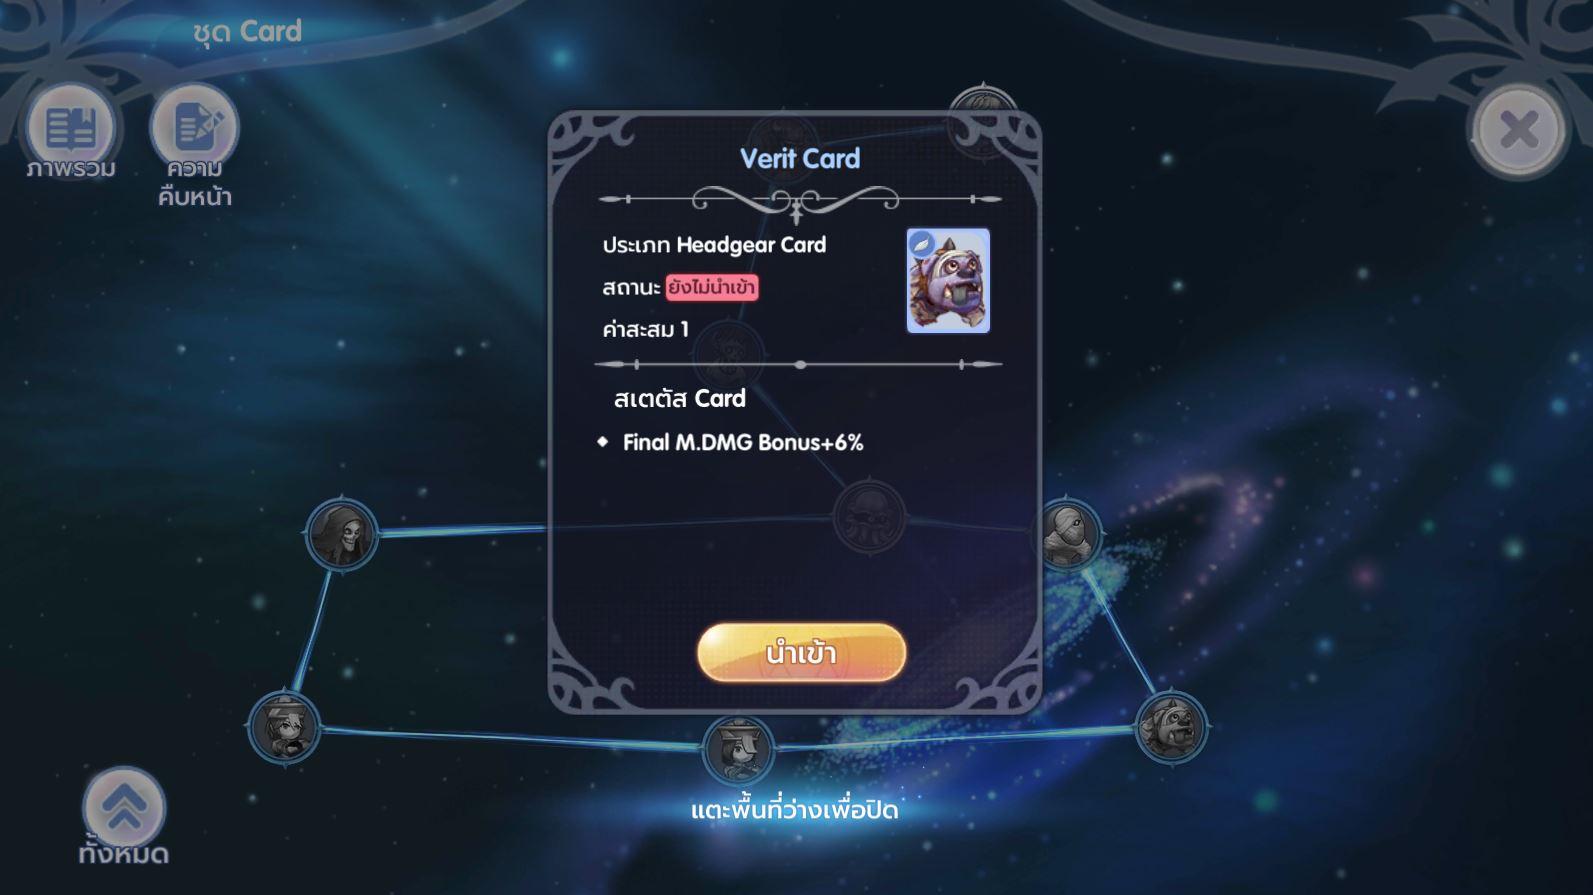 ROX การ์ดสายเวท Verit Card